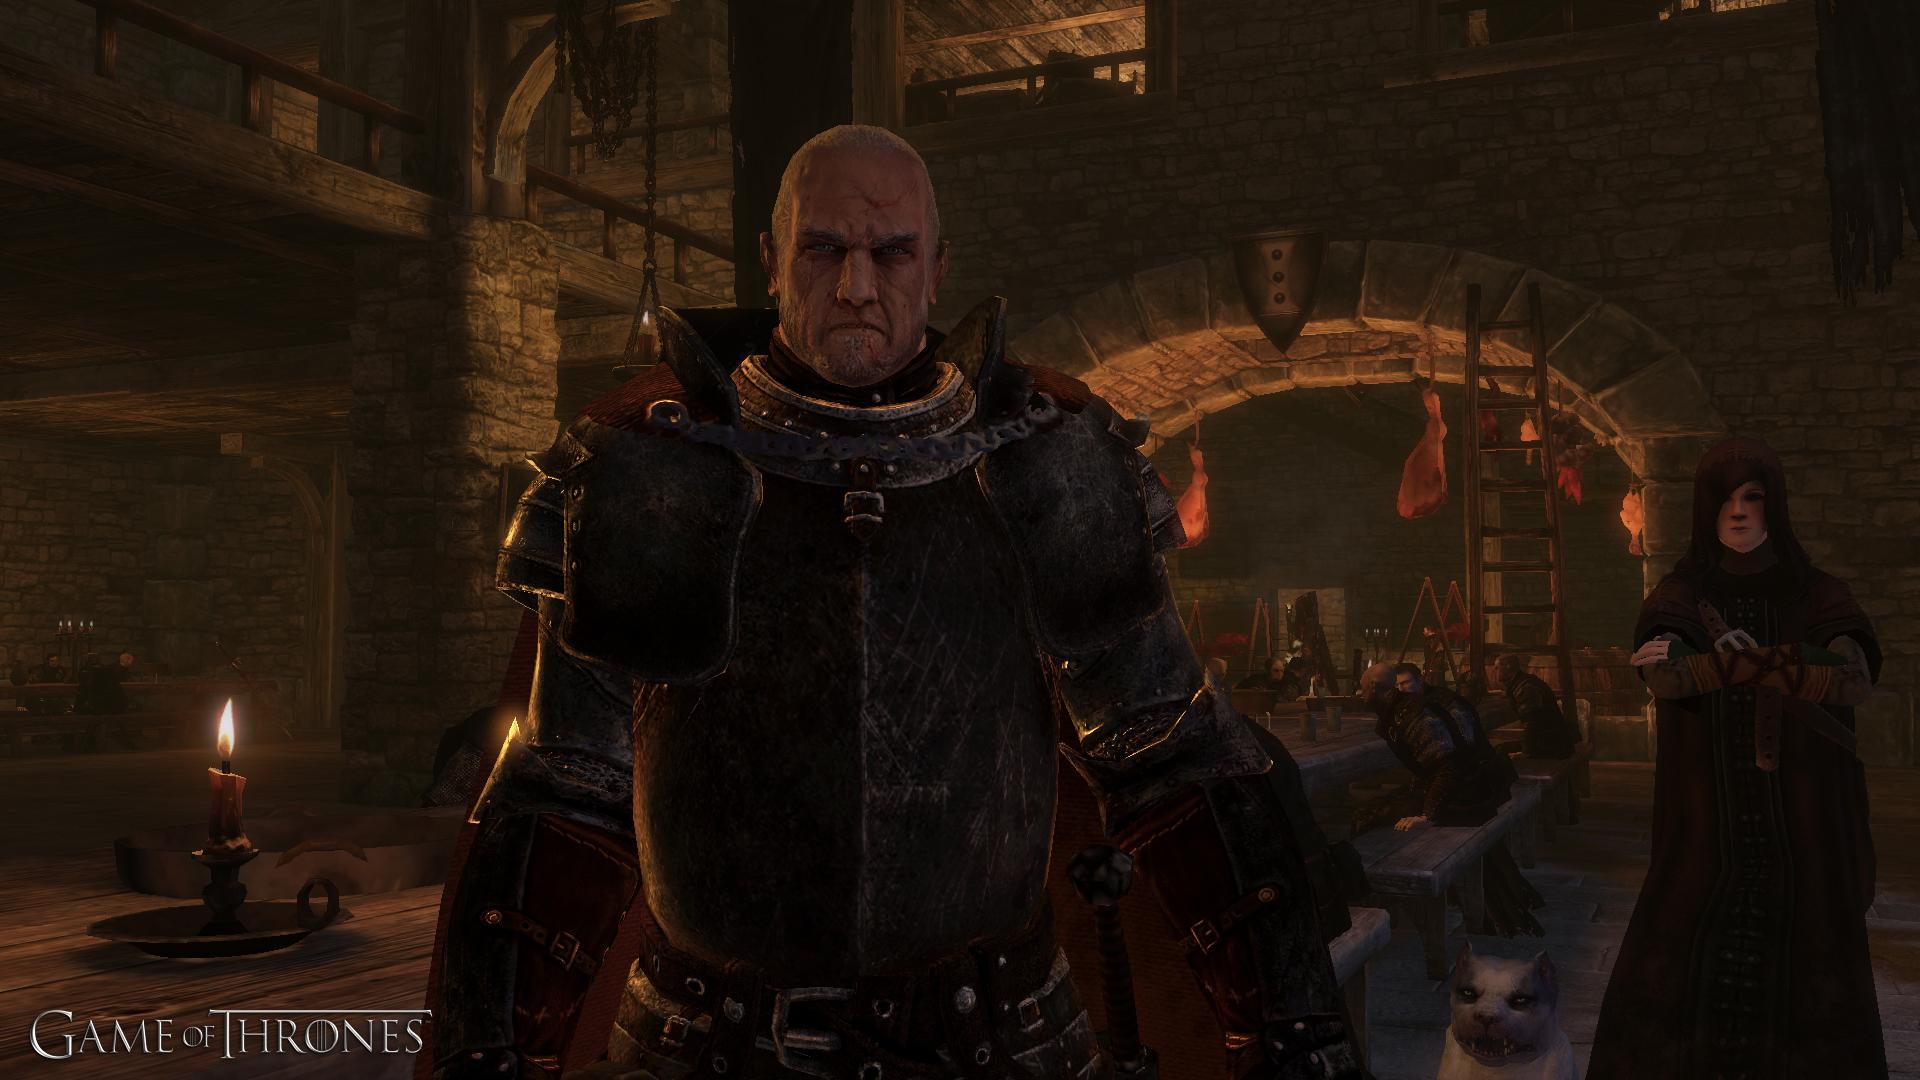 game_of_thrones-09.jpg